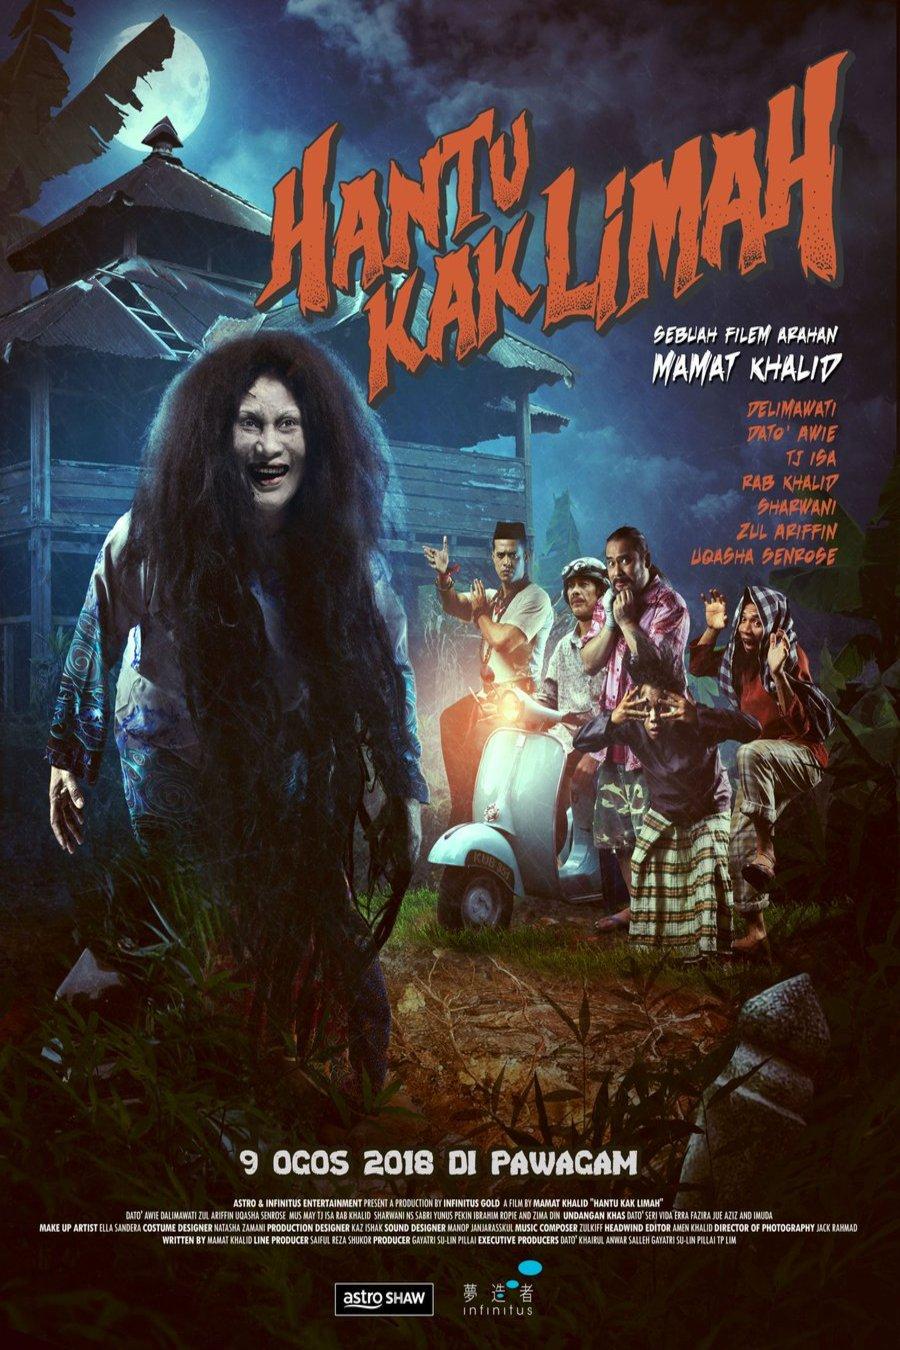 Hantu Kak Limah 2018 : hantu, limah, Hantu, Limah, (2018), Mamat, Khalid